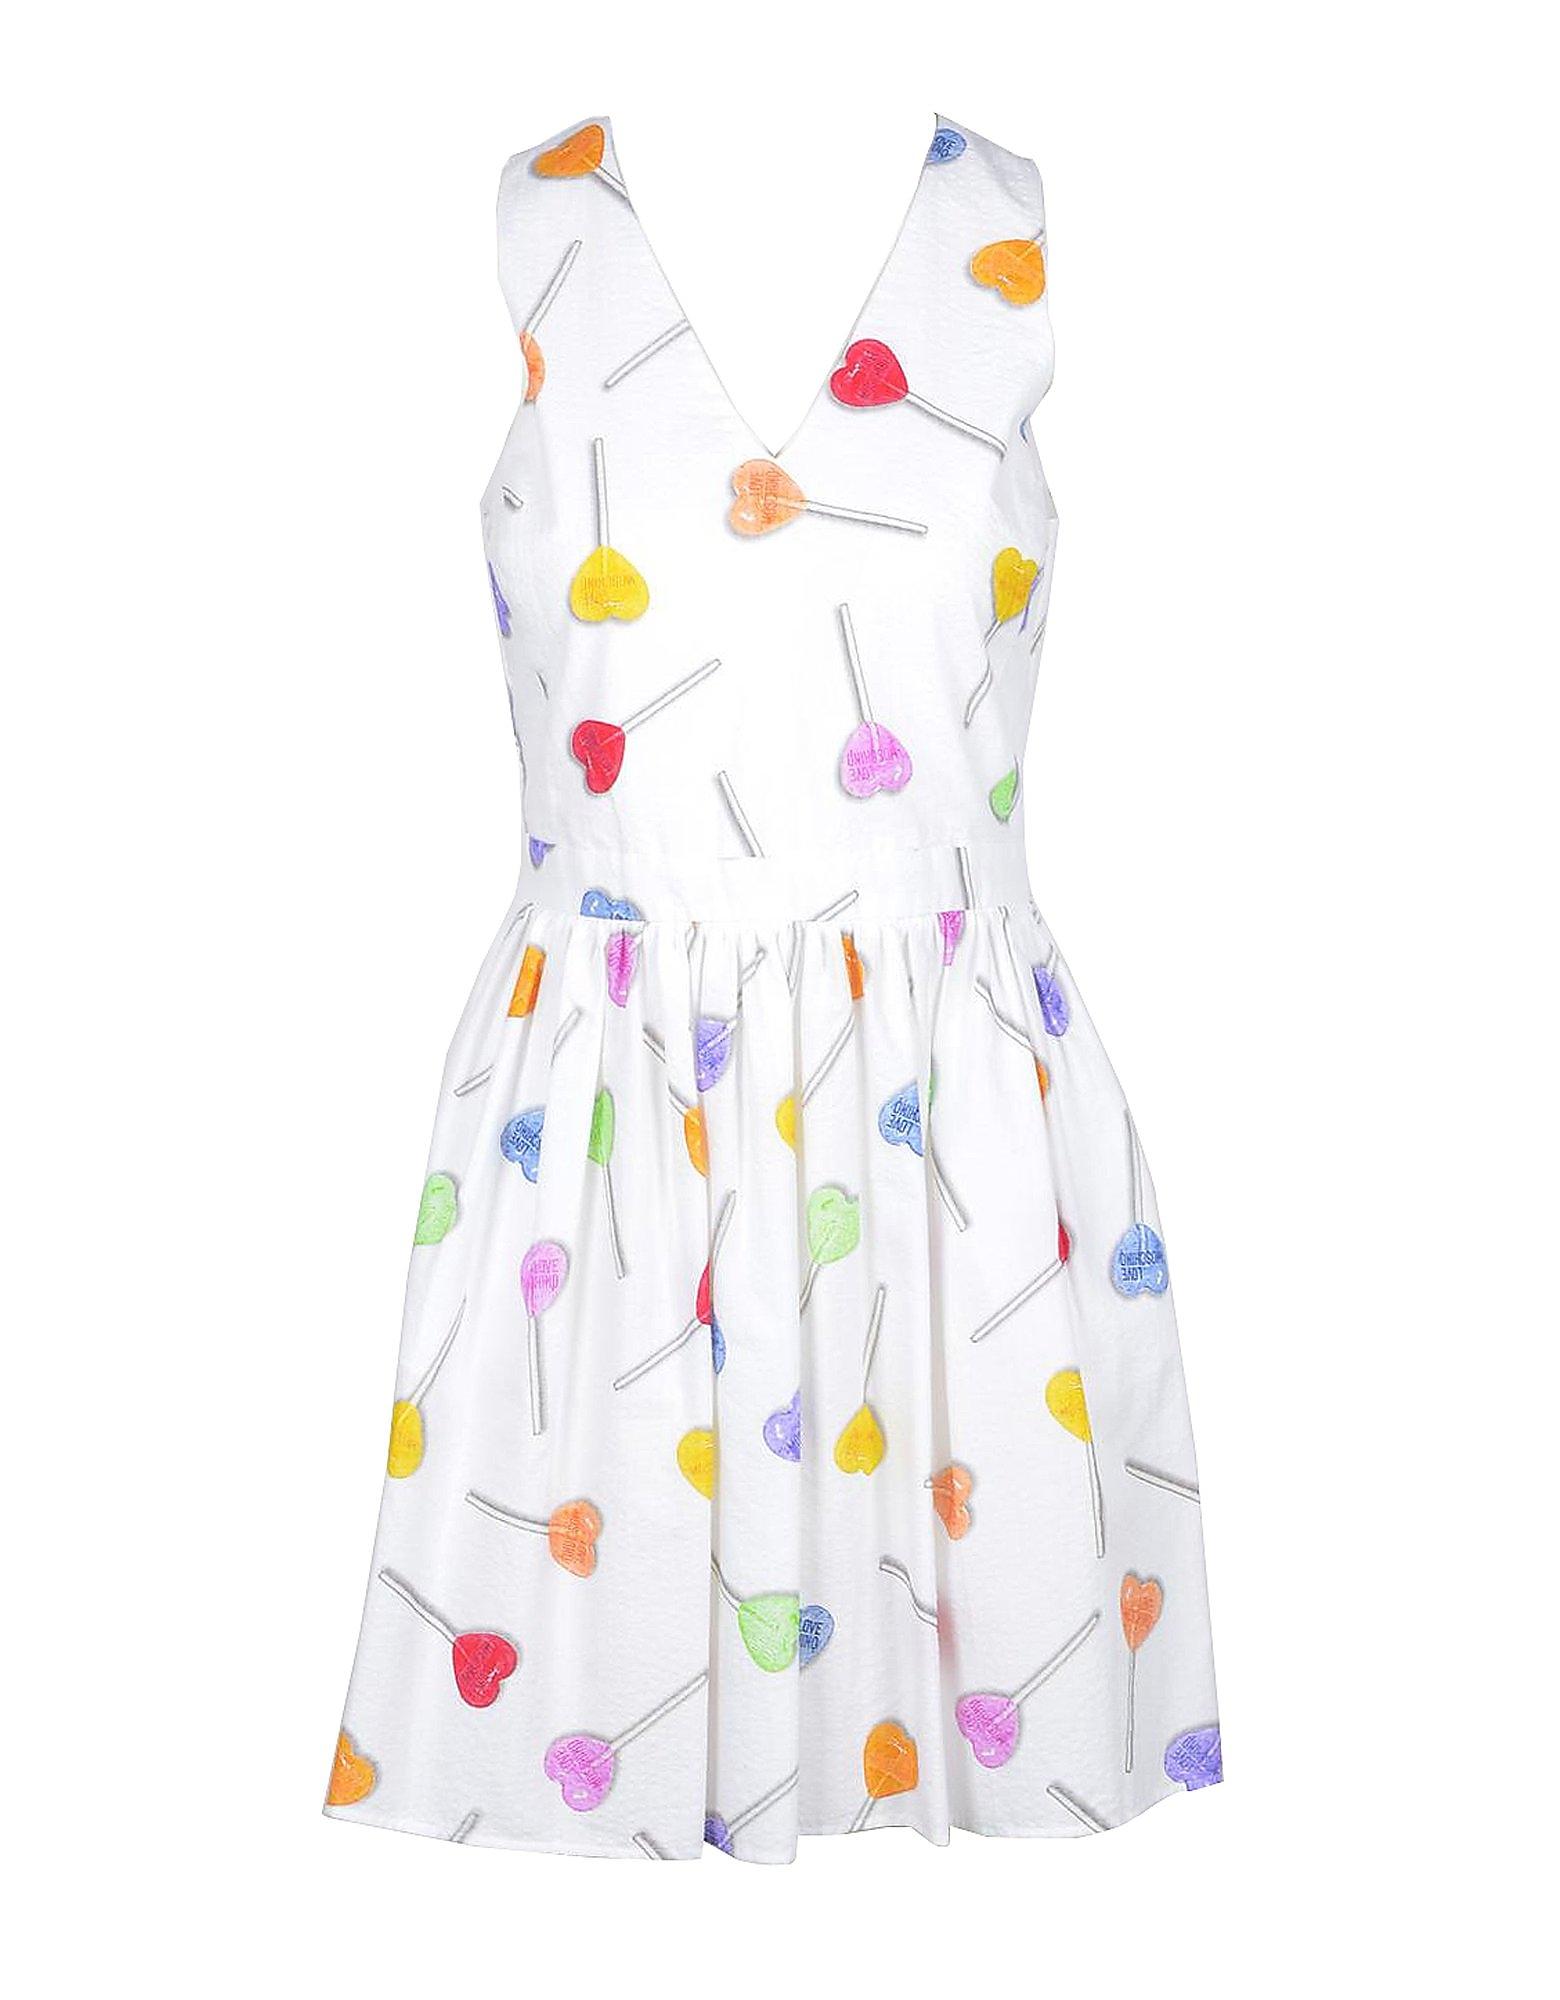 Love Moschino Designer Dresses & Jumpsuits, Women's White Dress